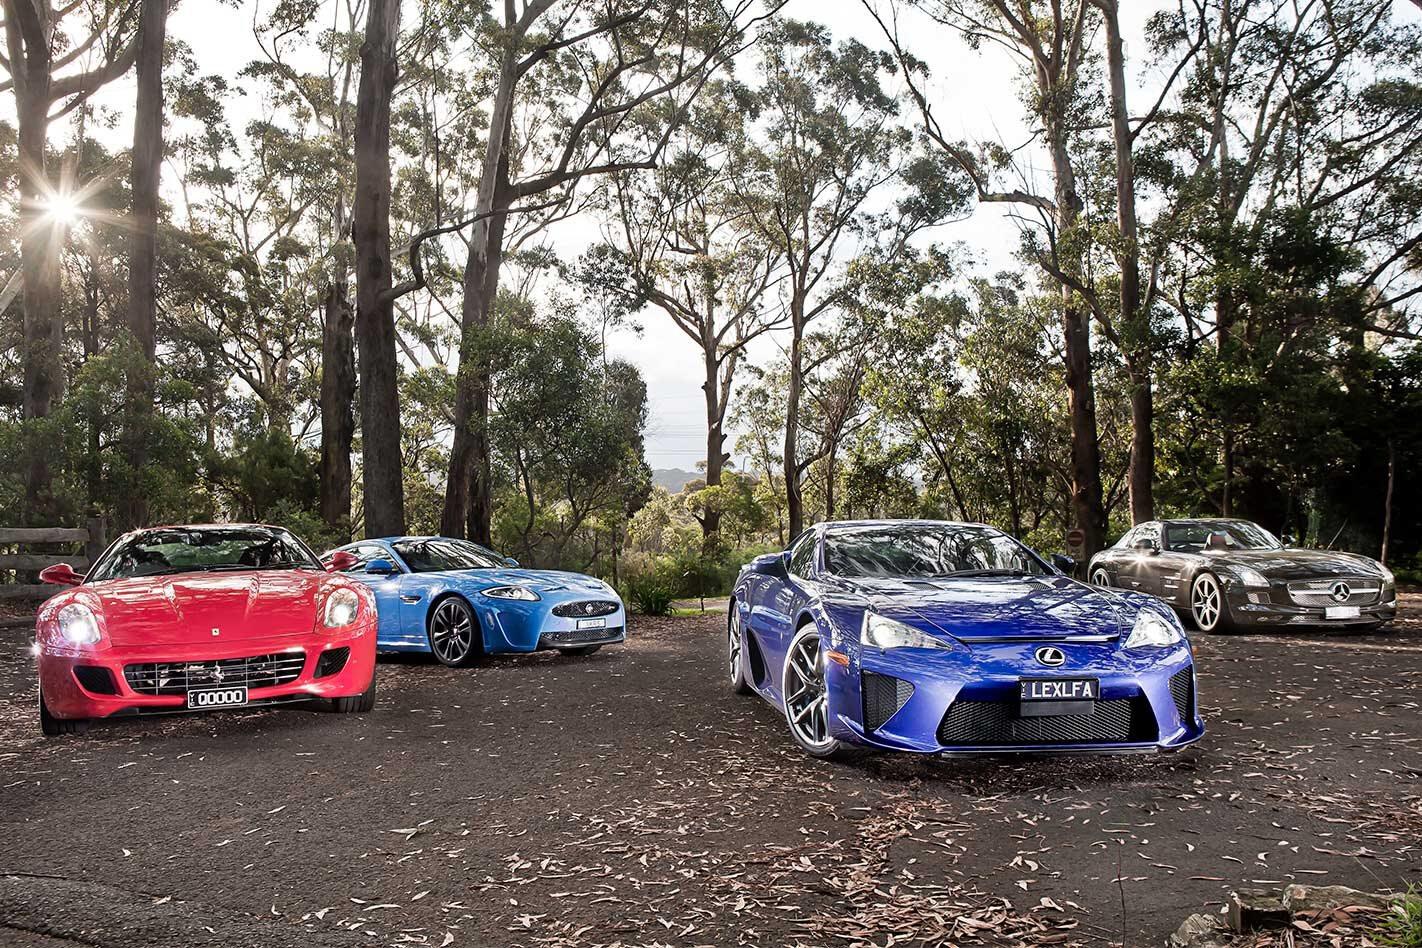 2011 Ferrari 599 v Lexus LFA v Mercedes-Benz SLS AMG v Jaguar XKR-S comparison